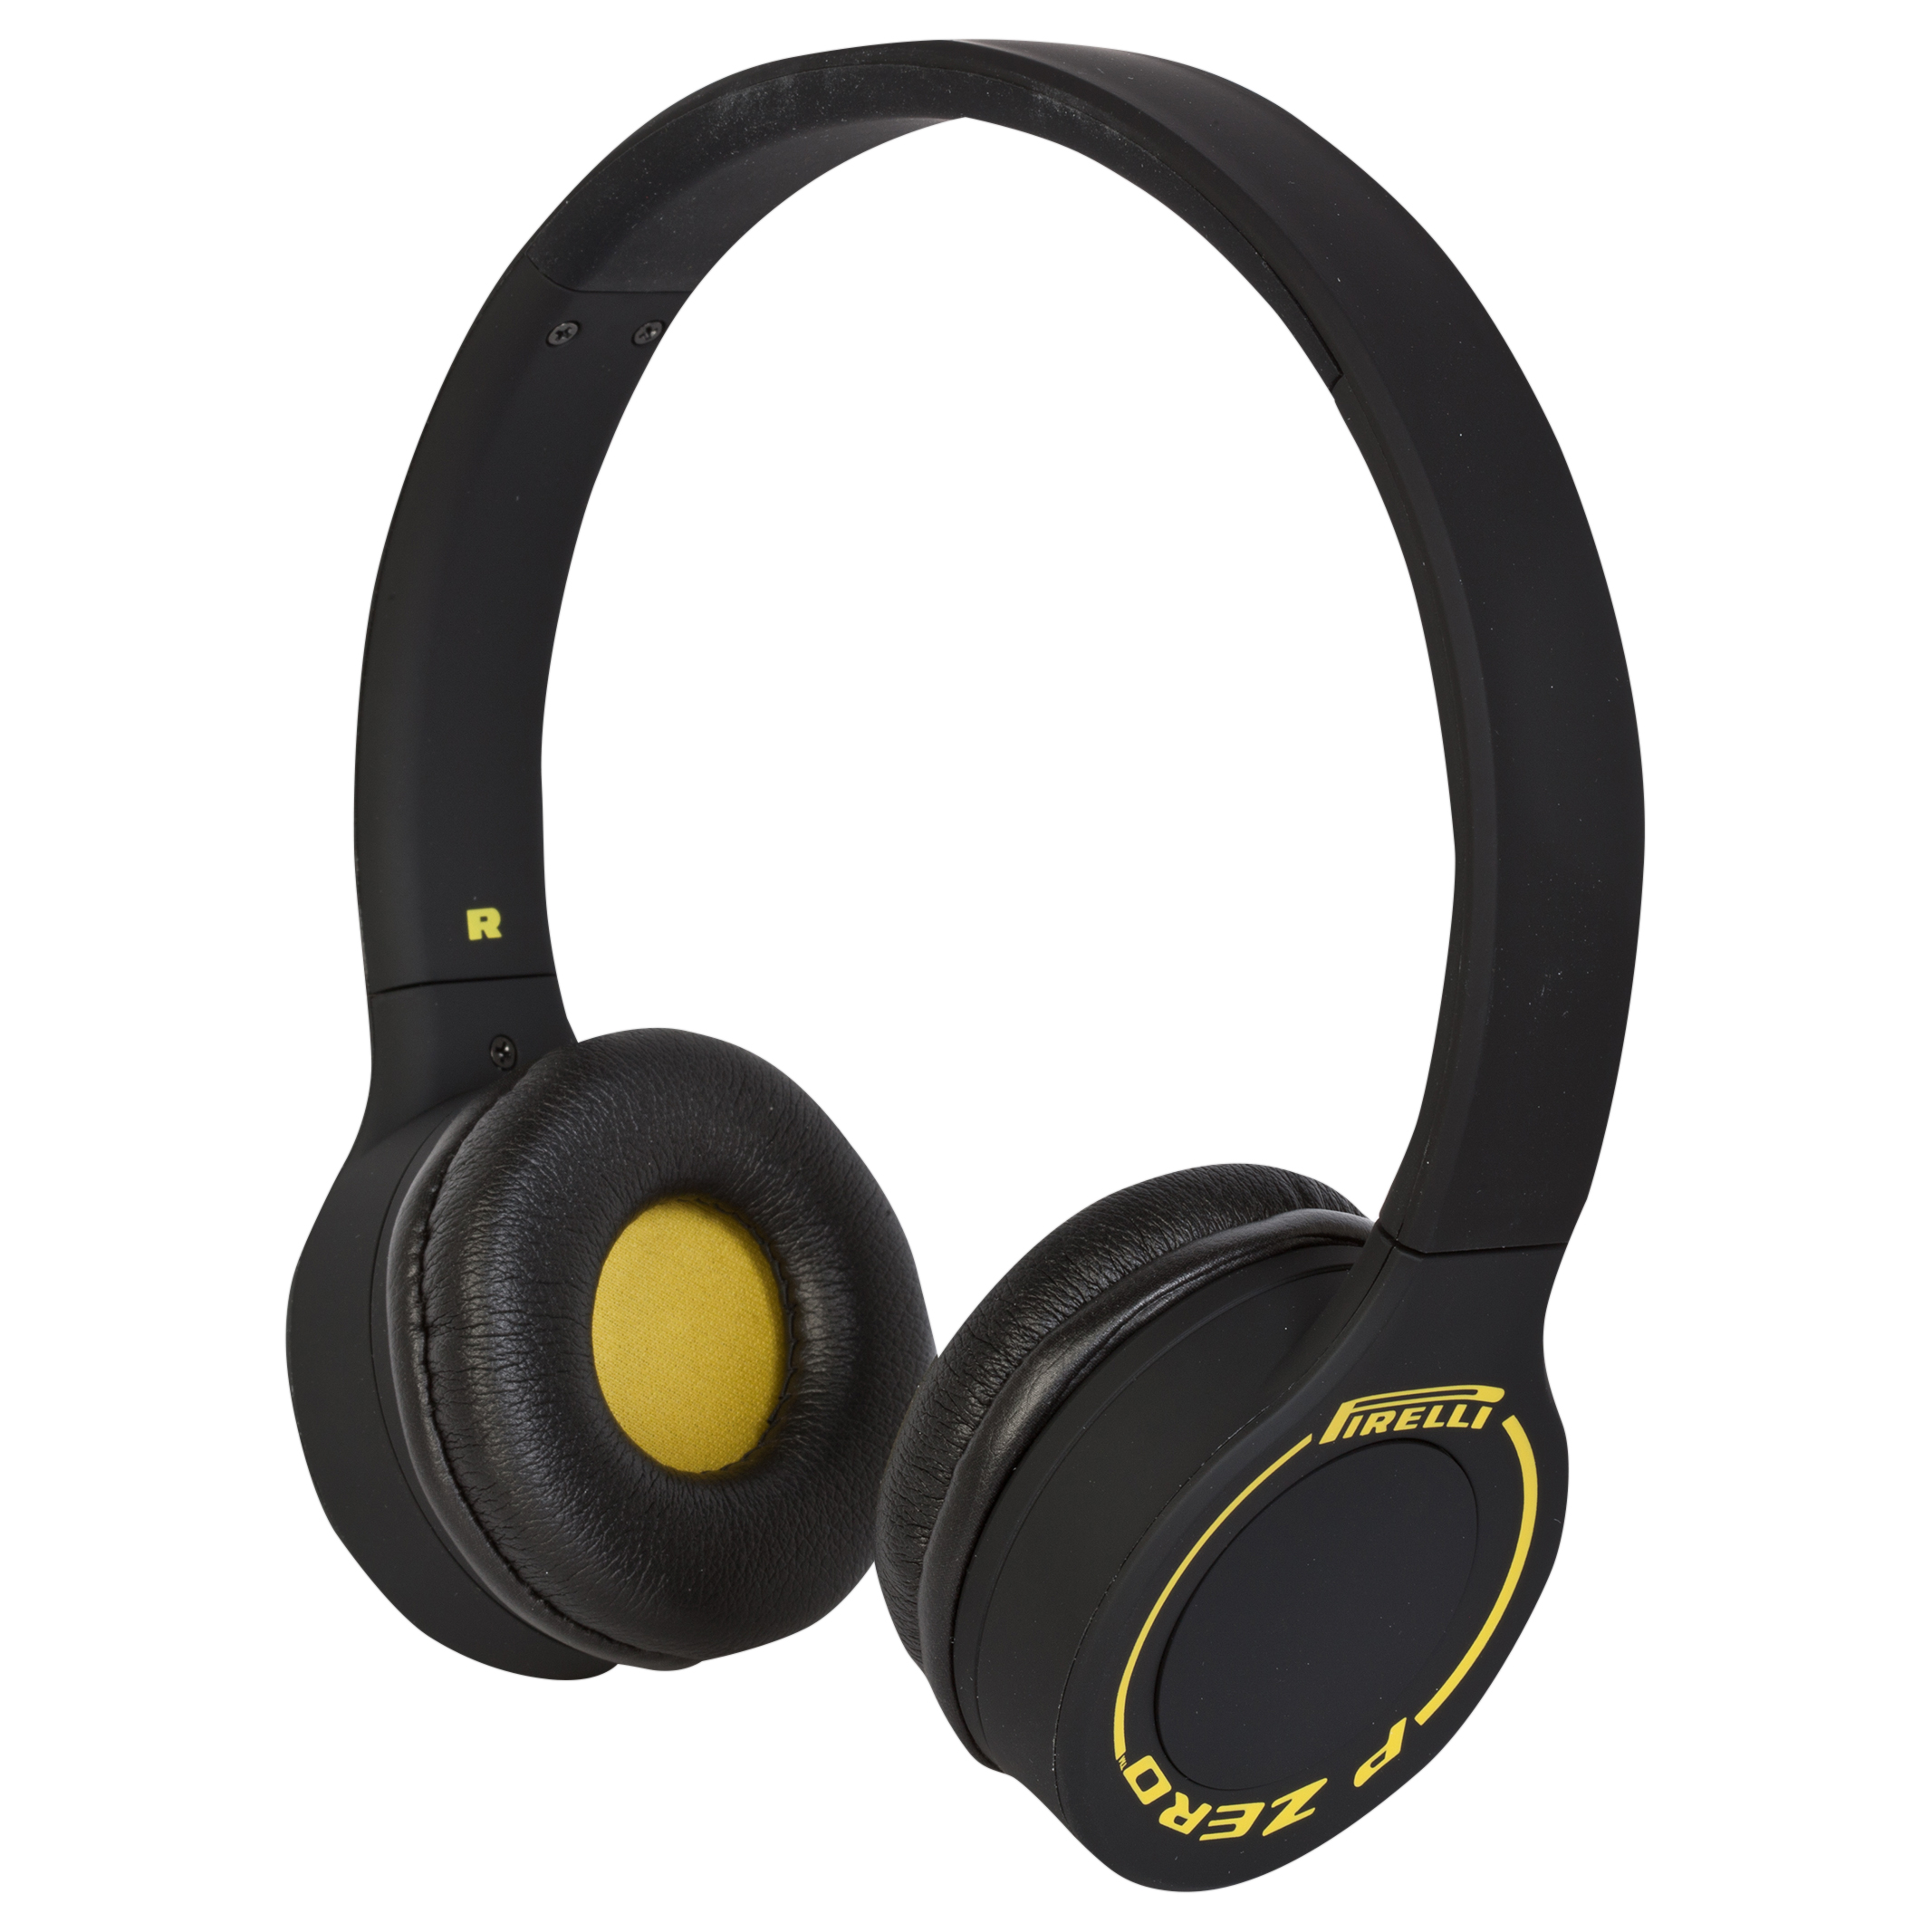 Pirelli Head Phones